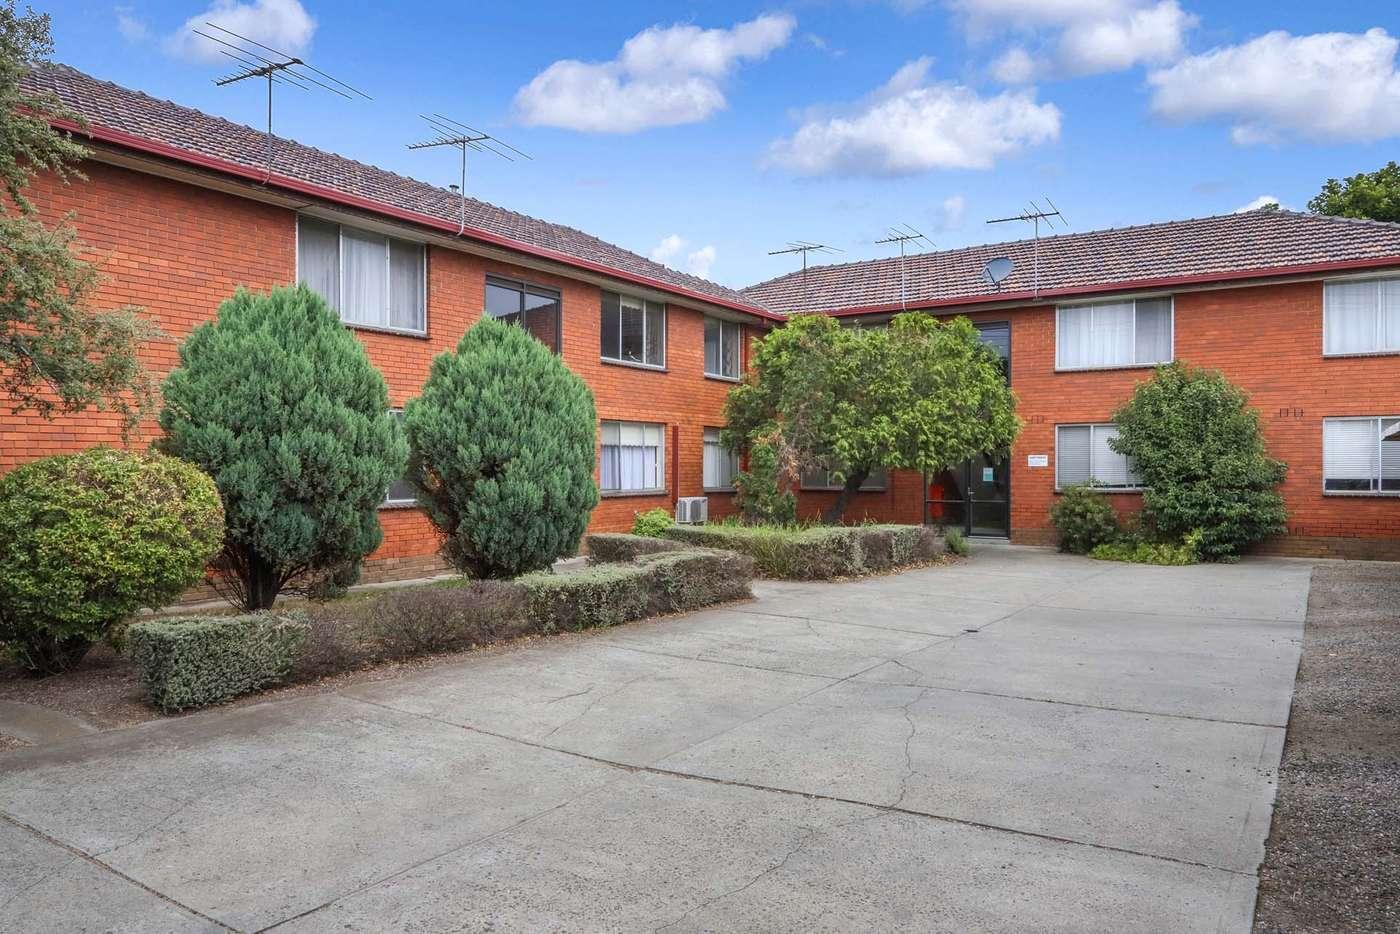 Main view of Homely apartment listing, 5/221 Blackshaws Road, Altona North VIC 3025